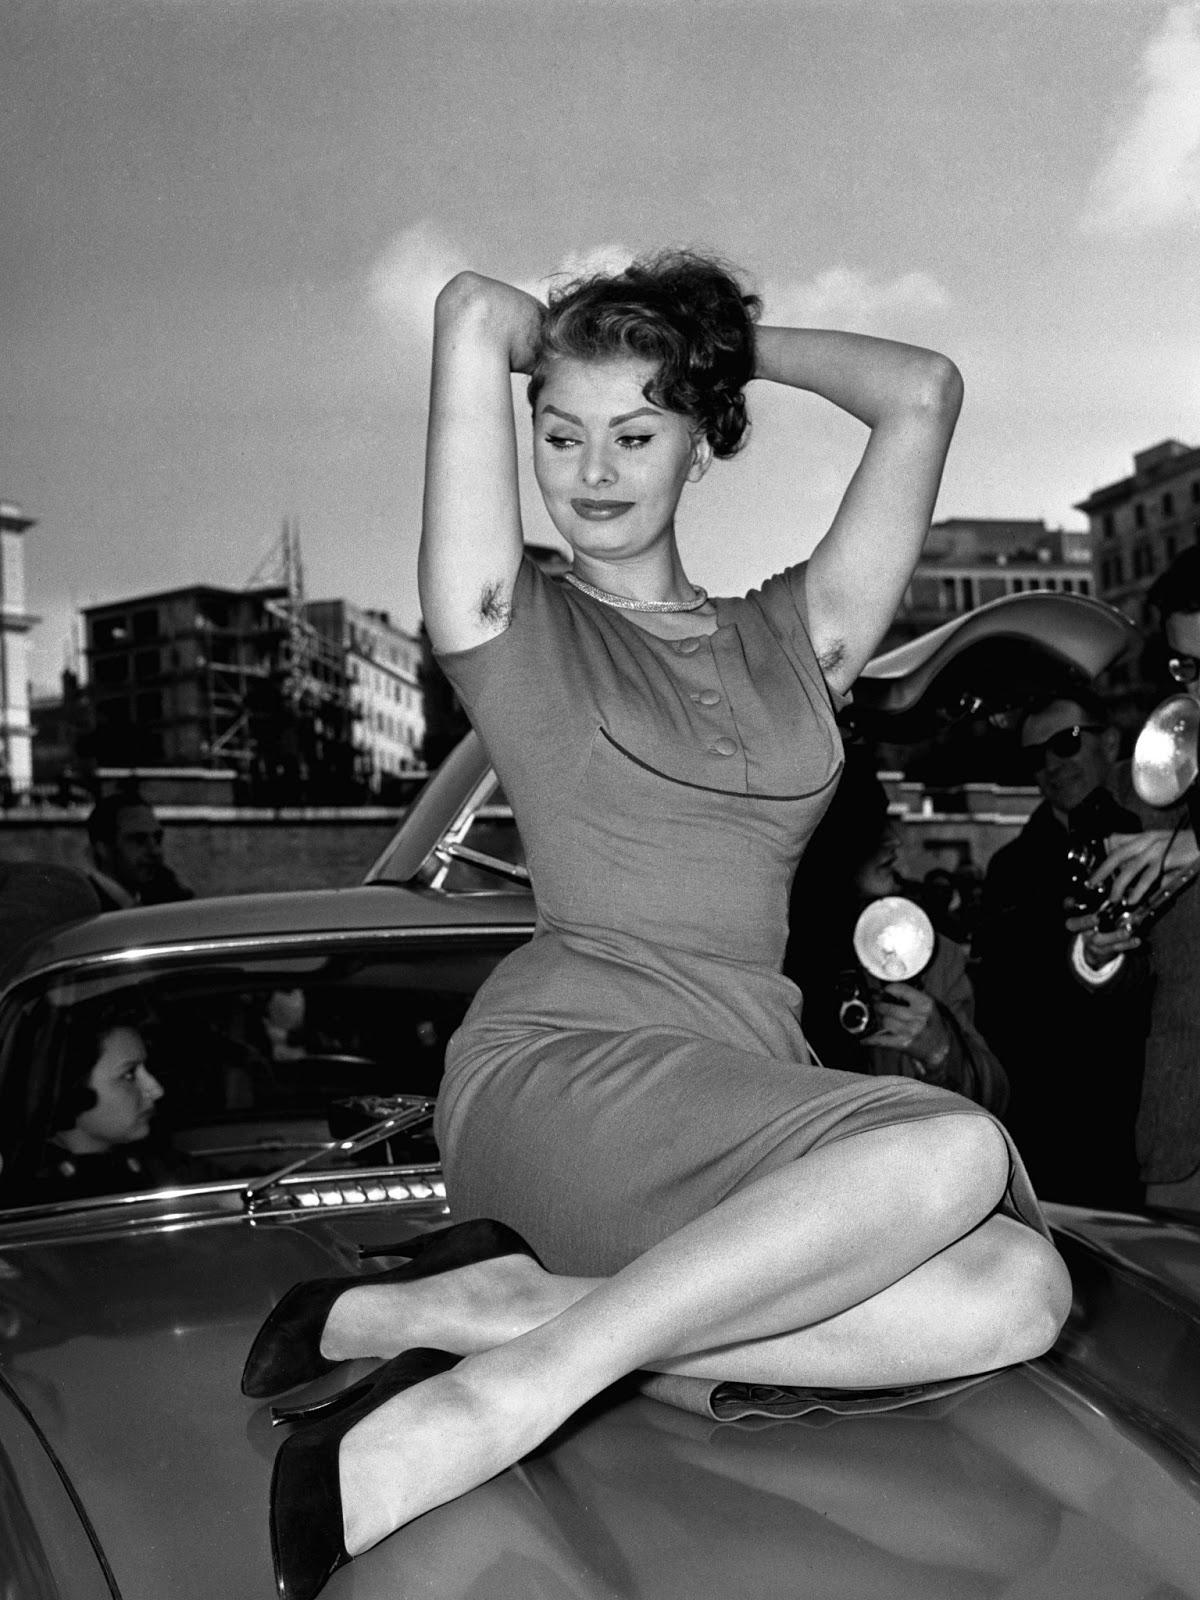 vintage armpits Rome, 1959